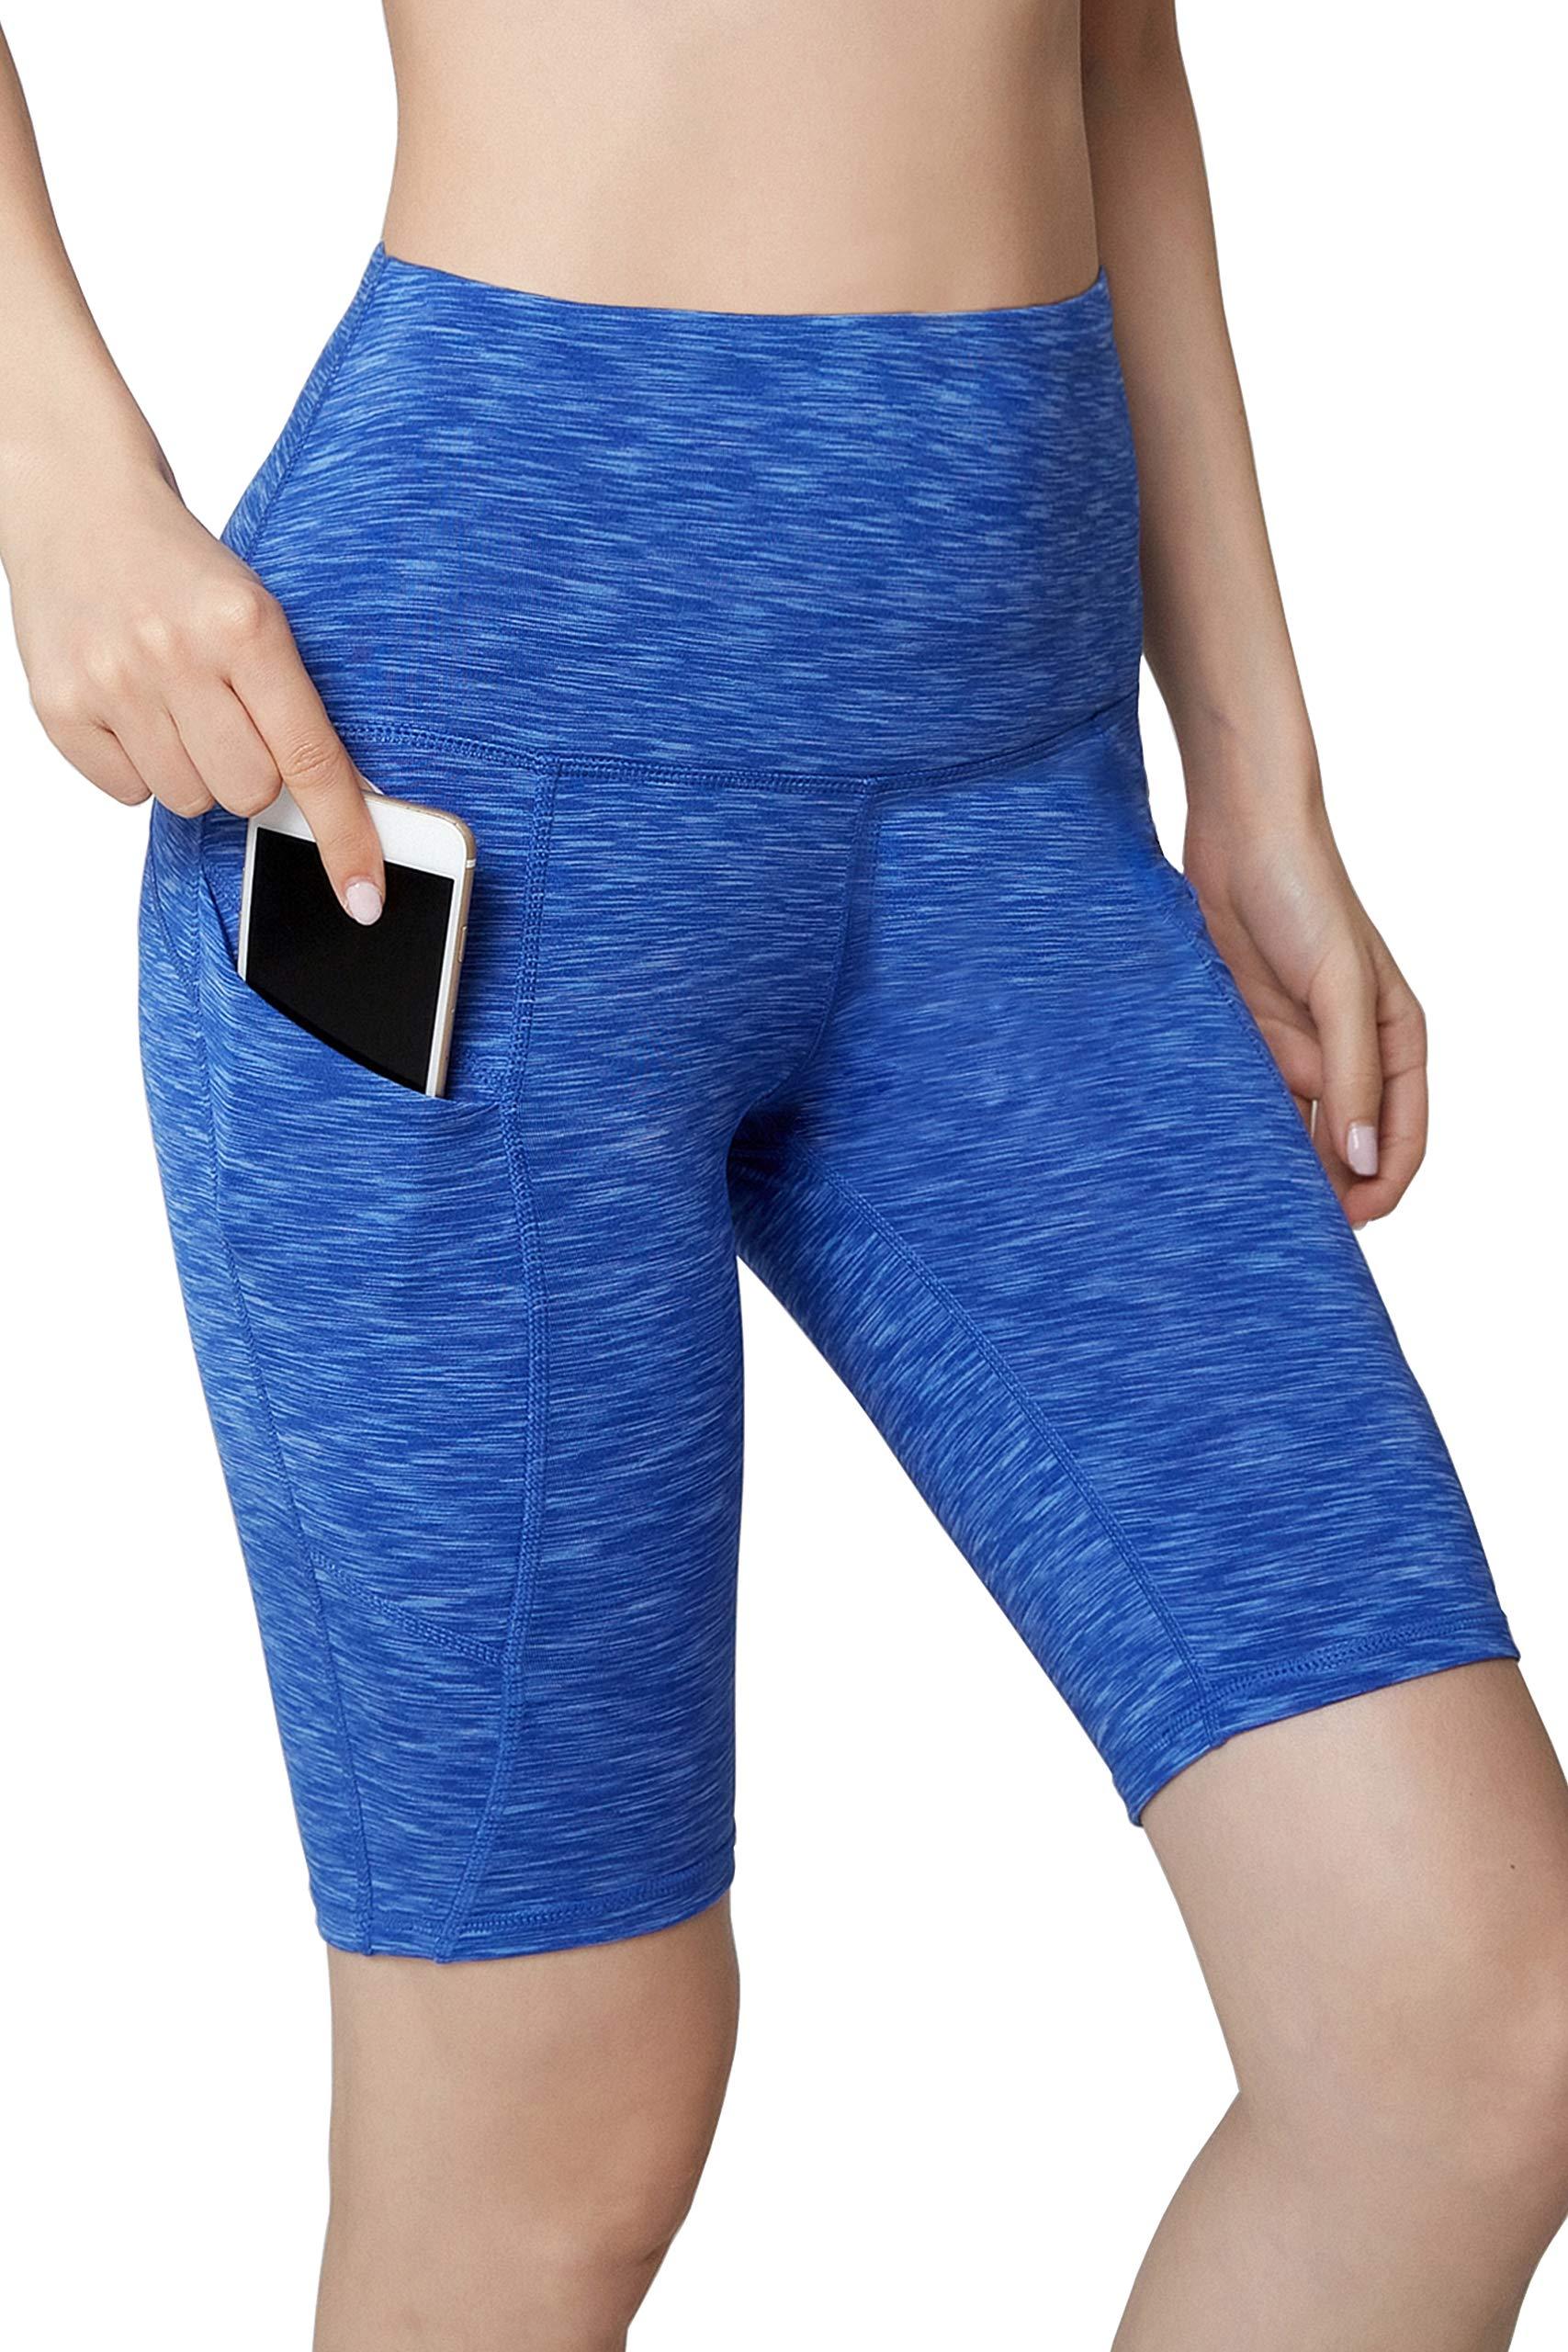 Oalka Women's Yoga Short Side Pockets High Waist Workout Running Shorts Space Dye Camo Blue L by Oalka